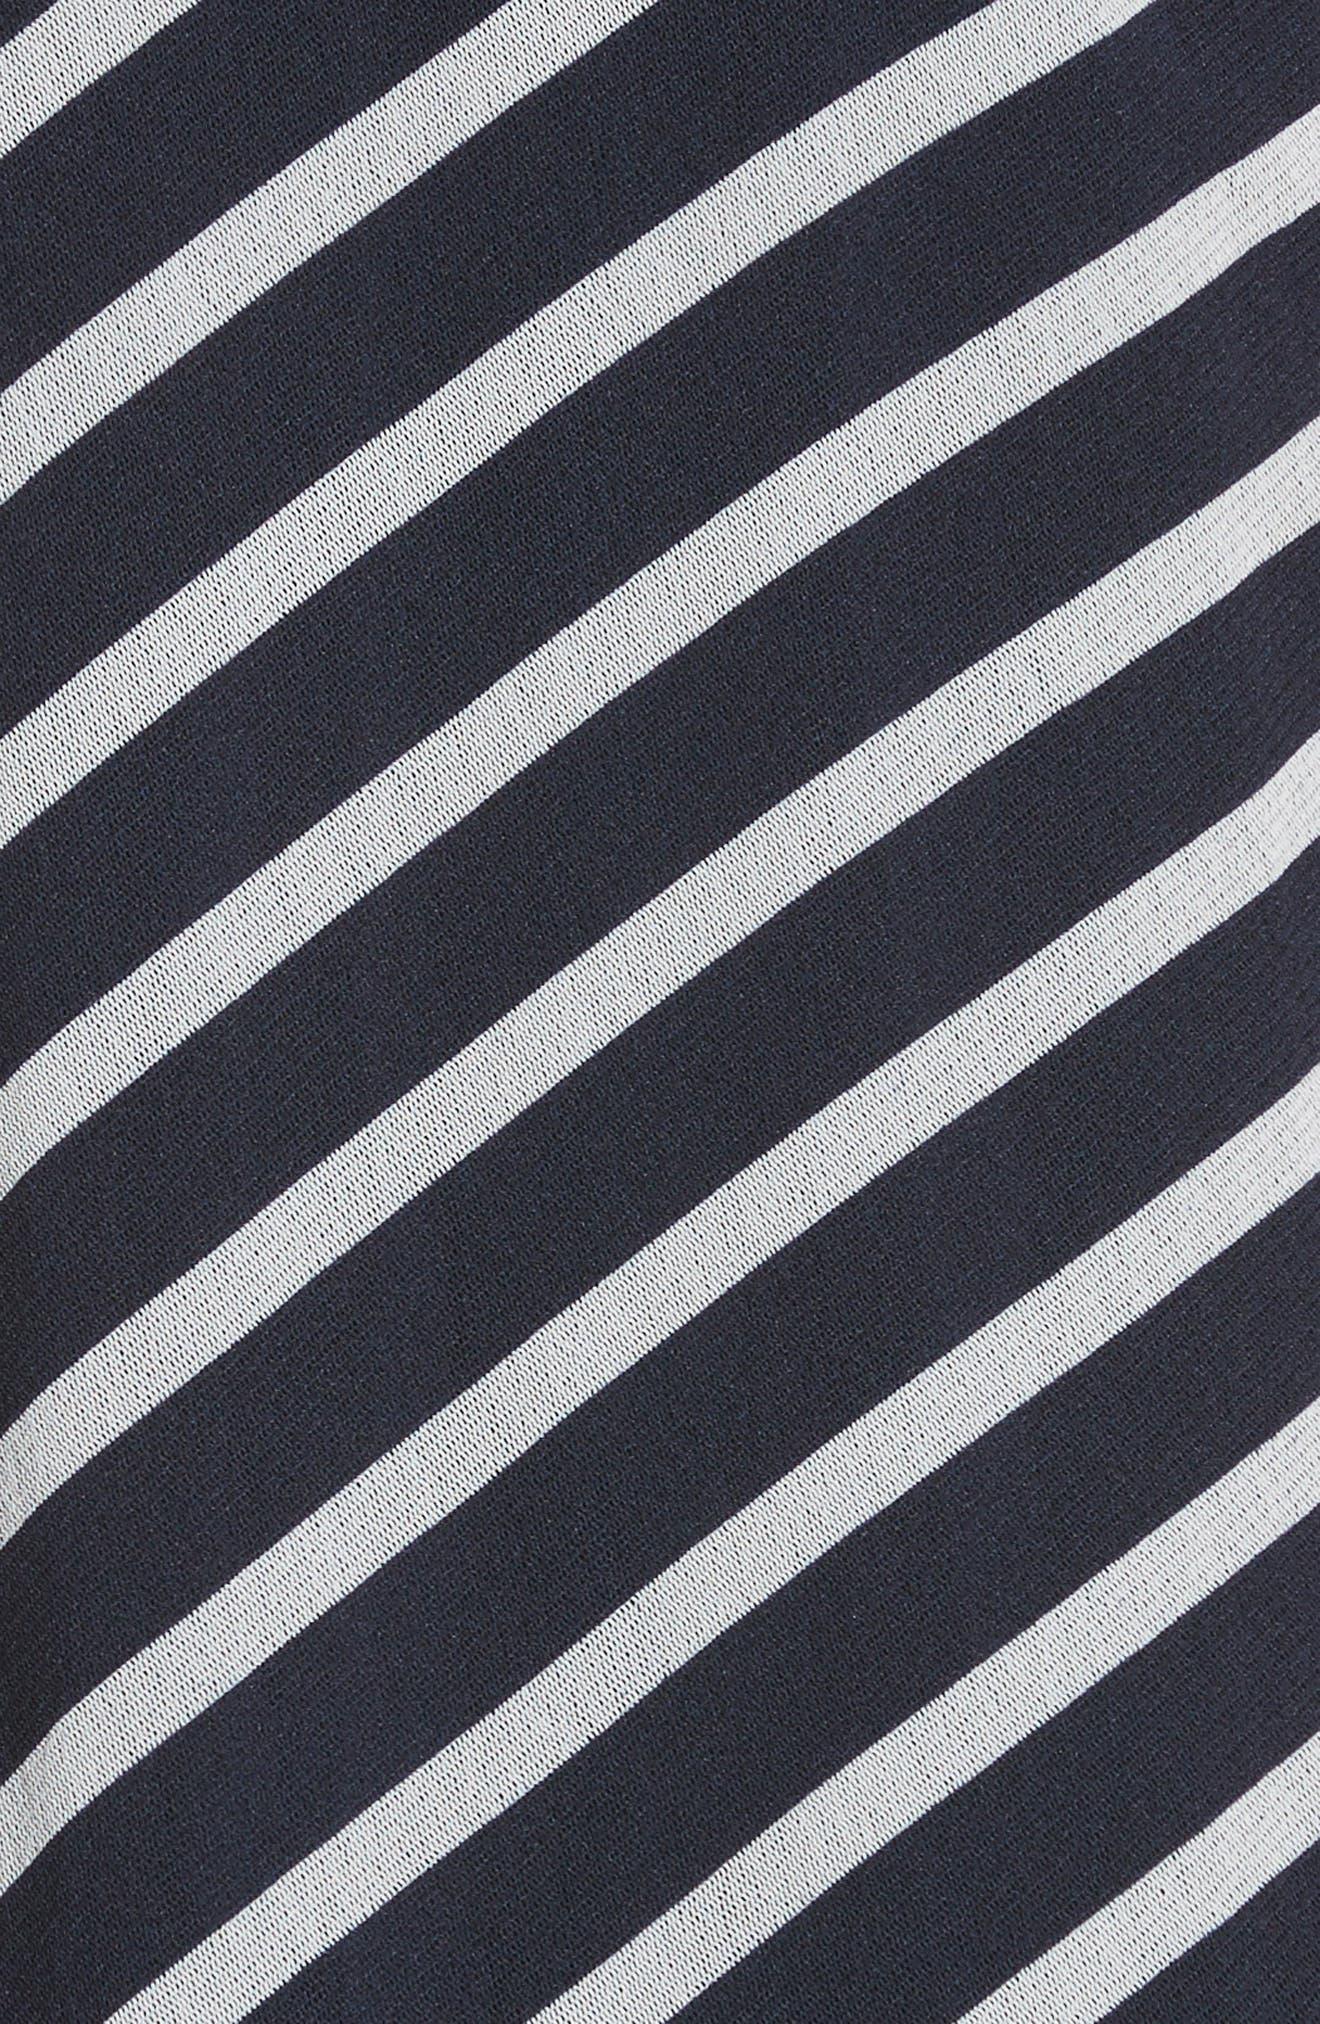 Stripe Maxi Tank Dress,                             Alternate thumbnail 5, color,                             Zaffiro